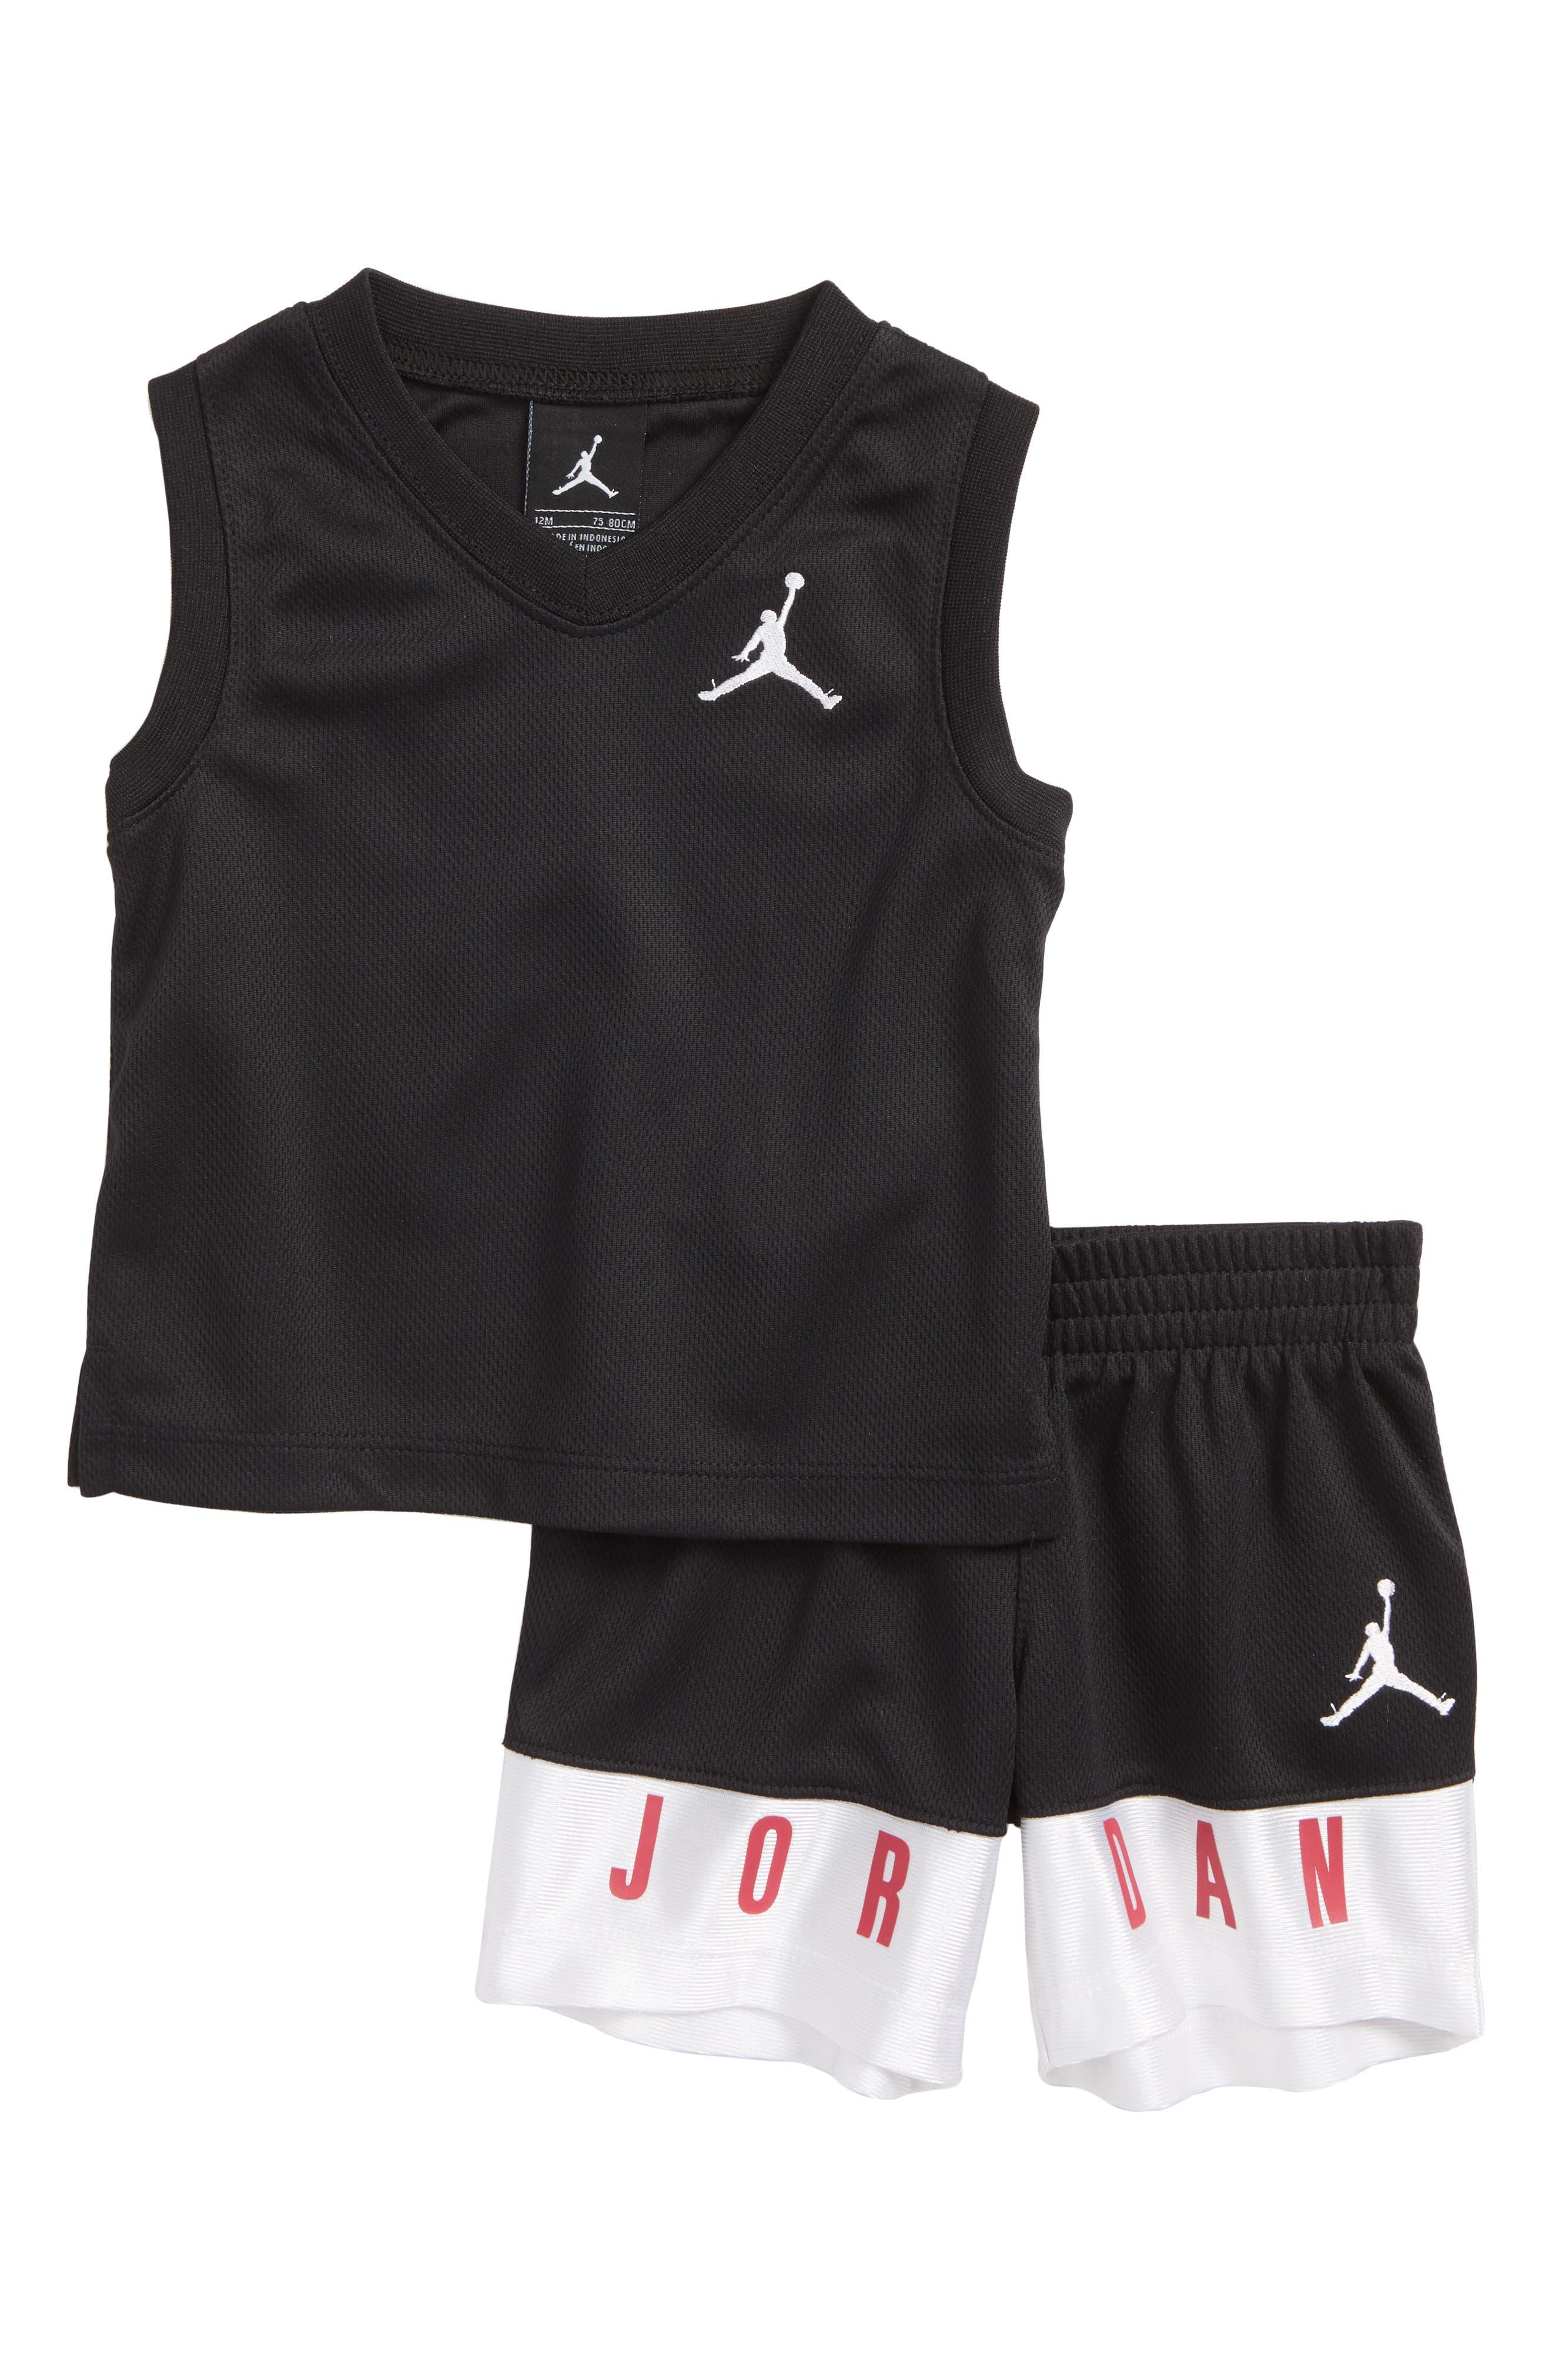 AJ23 Jersey Tank Top & Mesh Shorts Set,                         Main,                         color, Black